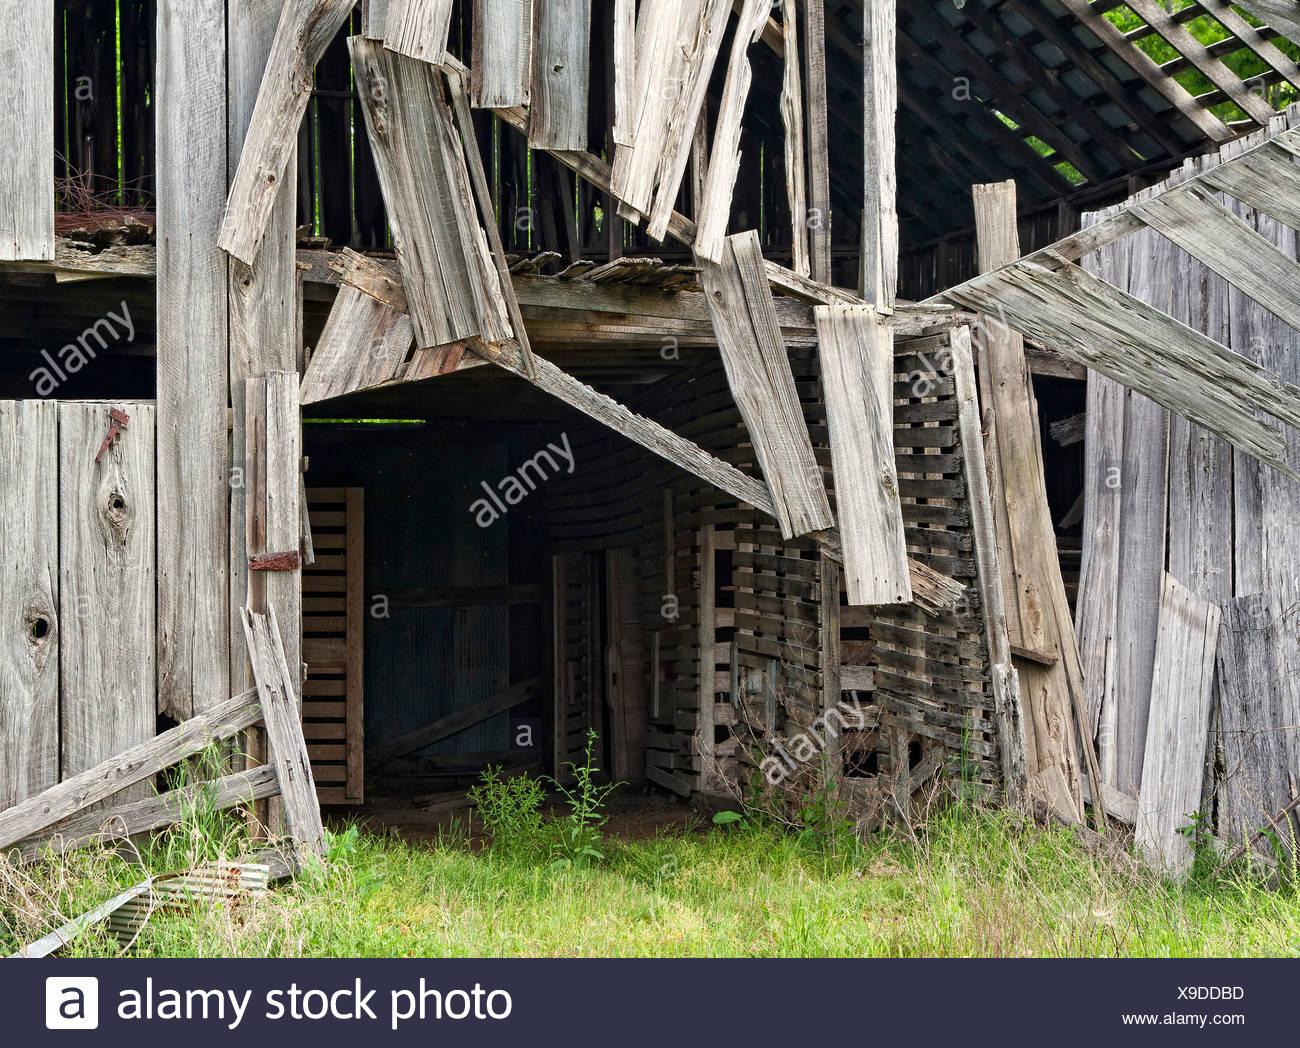 Detail of old barn in disrepair - Stock Image